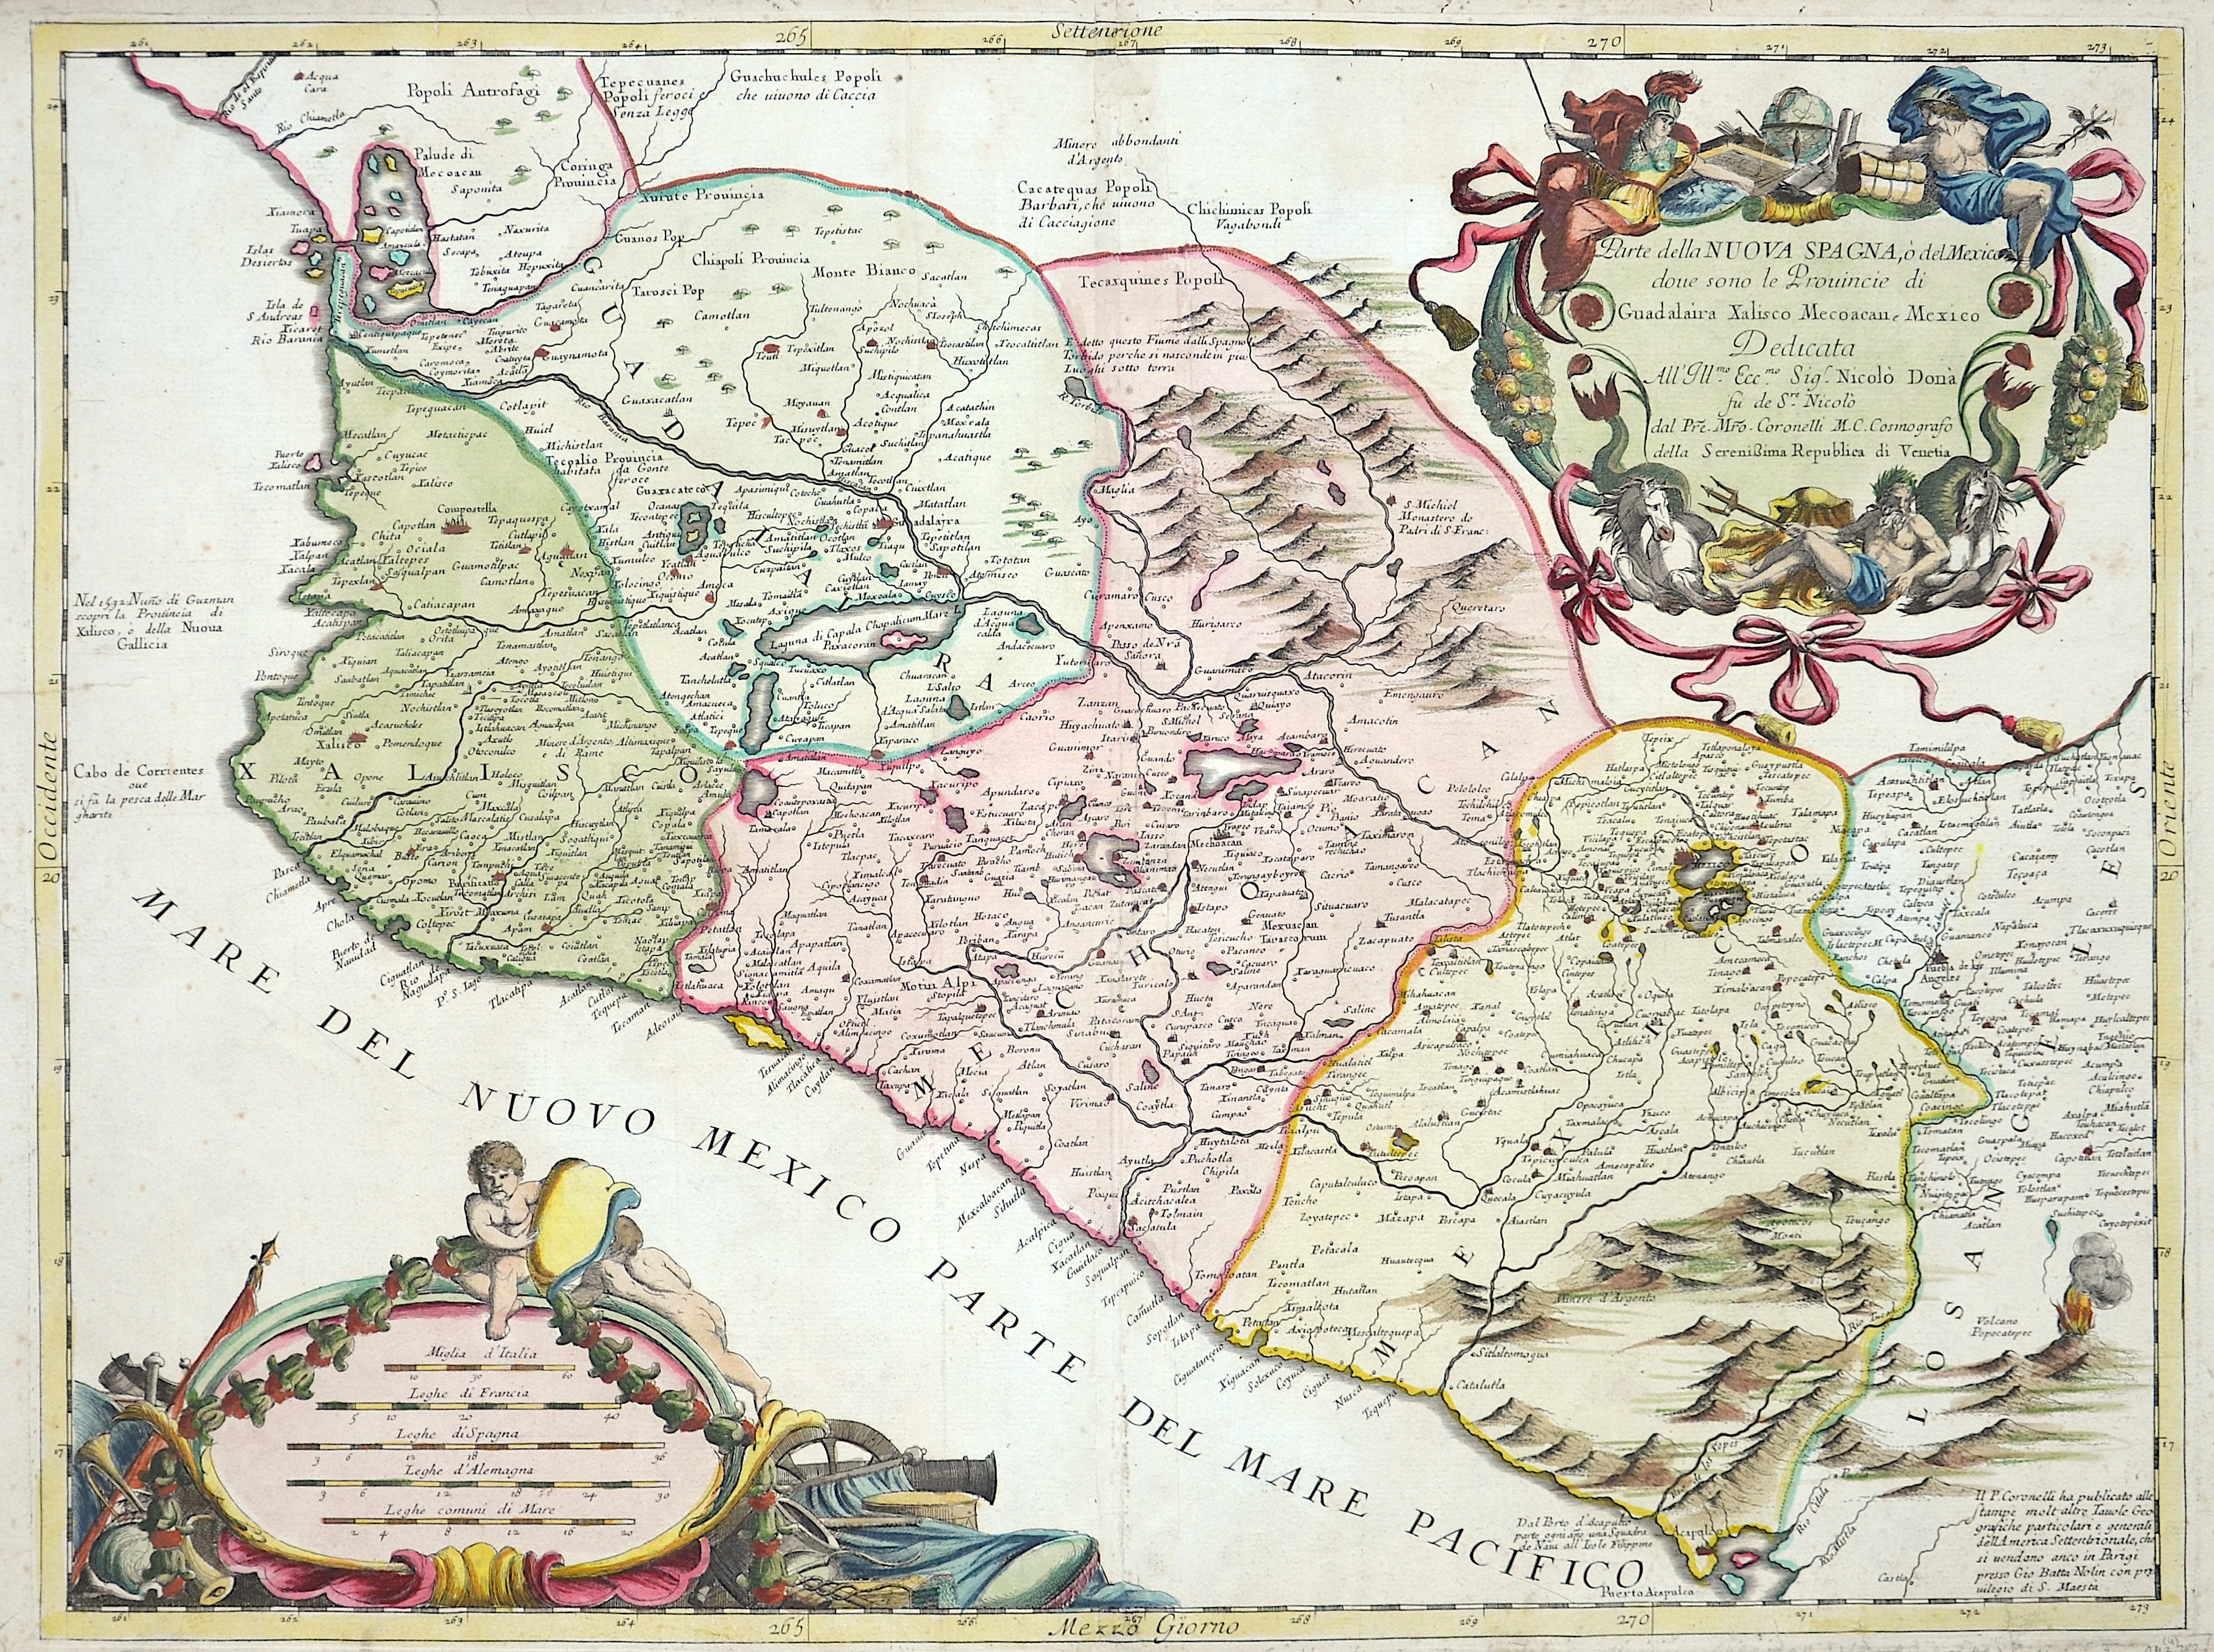 Coronelli  Parte dela nouva Spagna, o´del Mexico doue sono le Provincie di Gudalaira xalisco mecoacan, Mexico dedicata